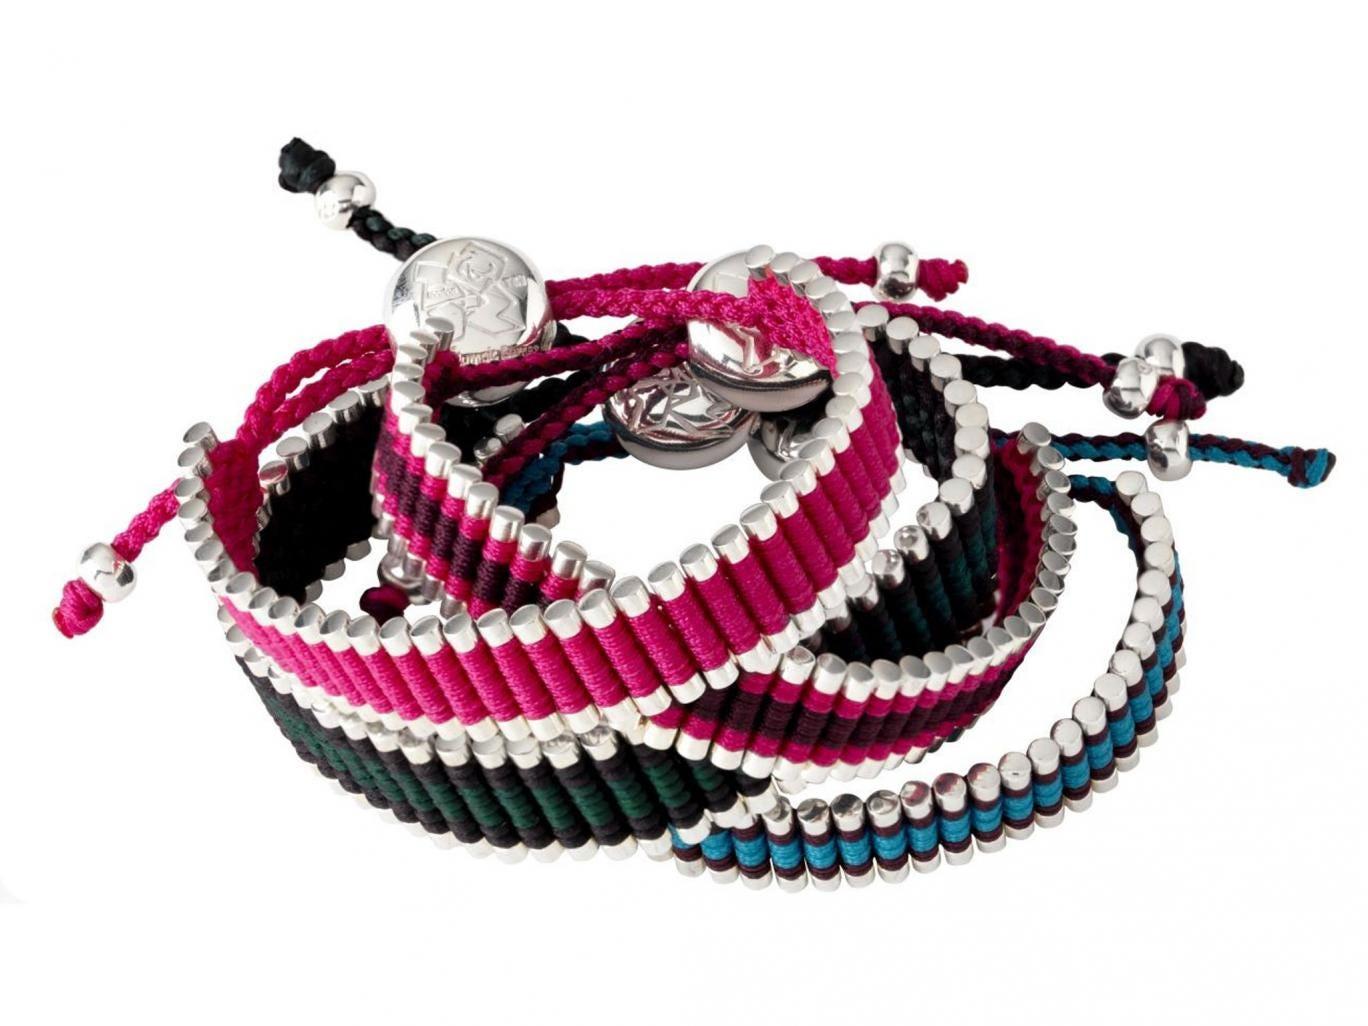 Friendship bracelets from Links of London